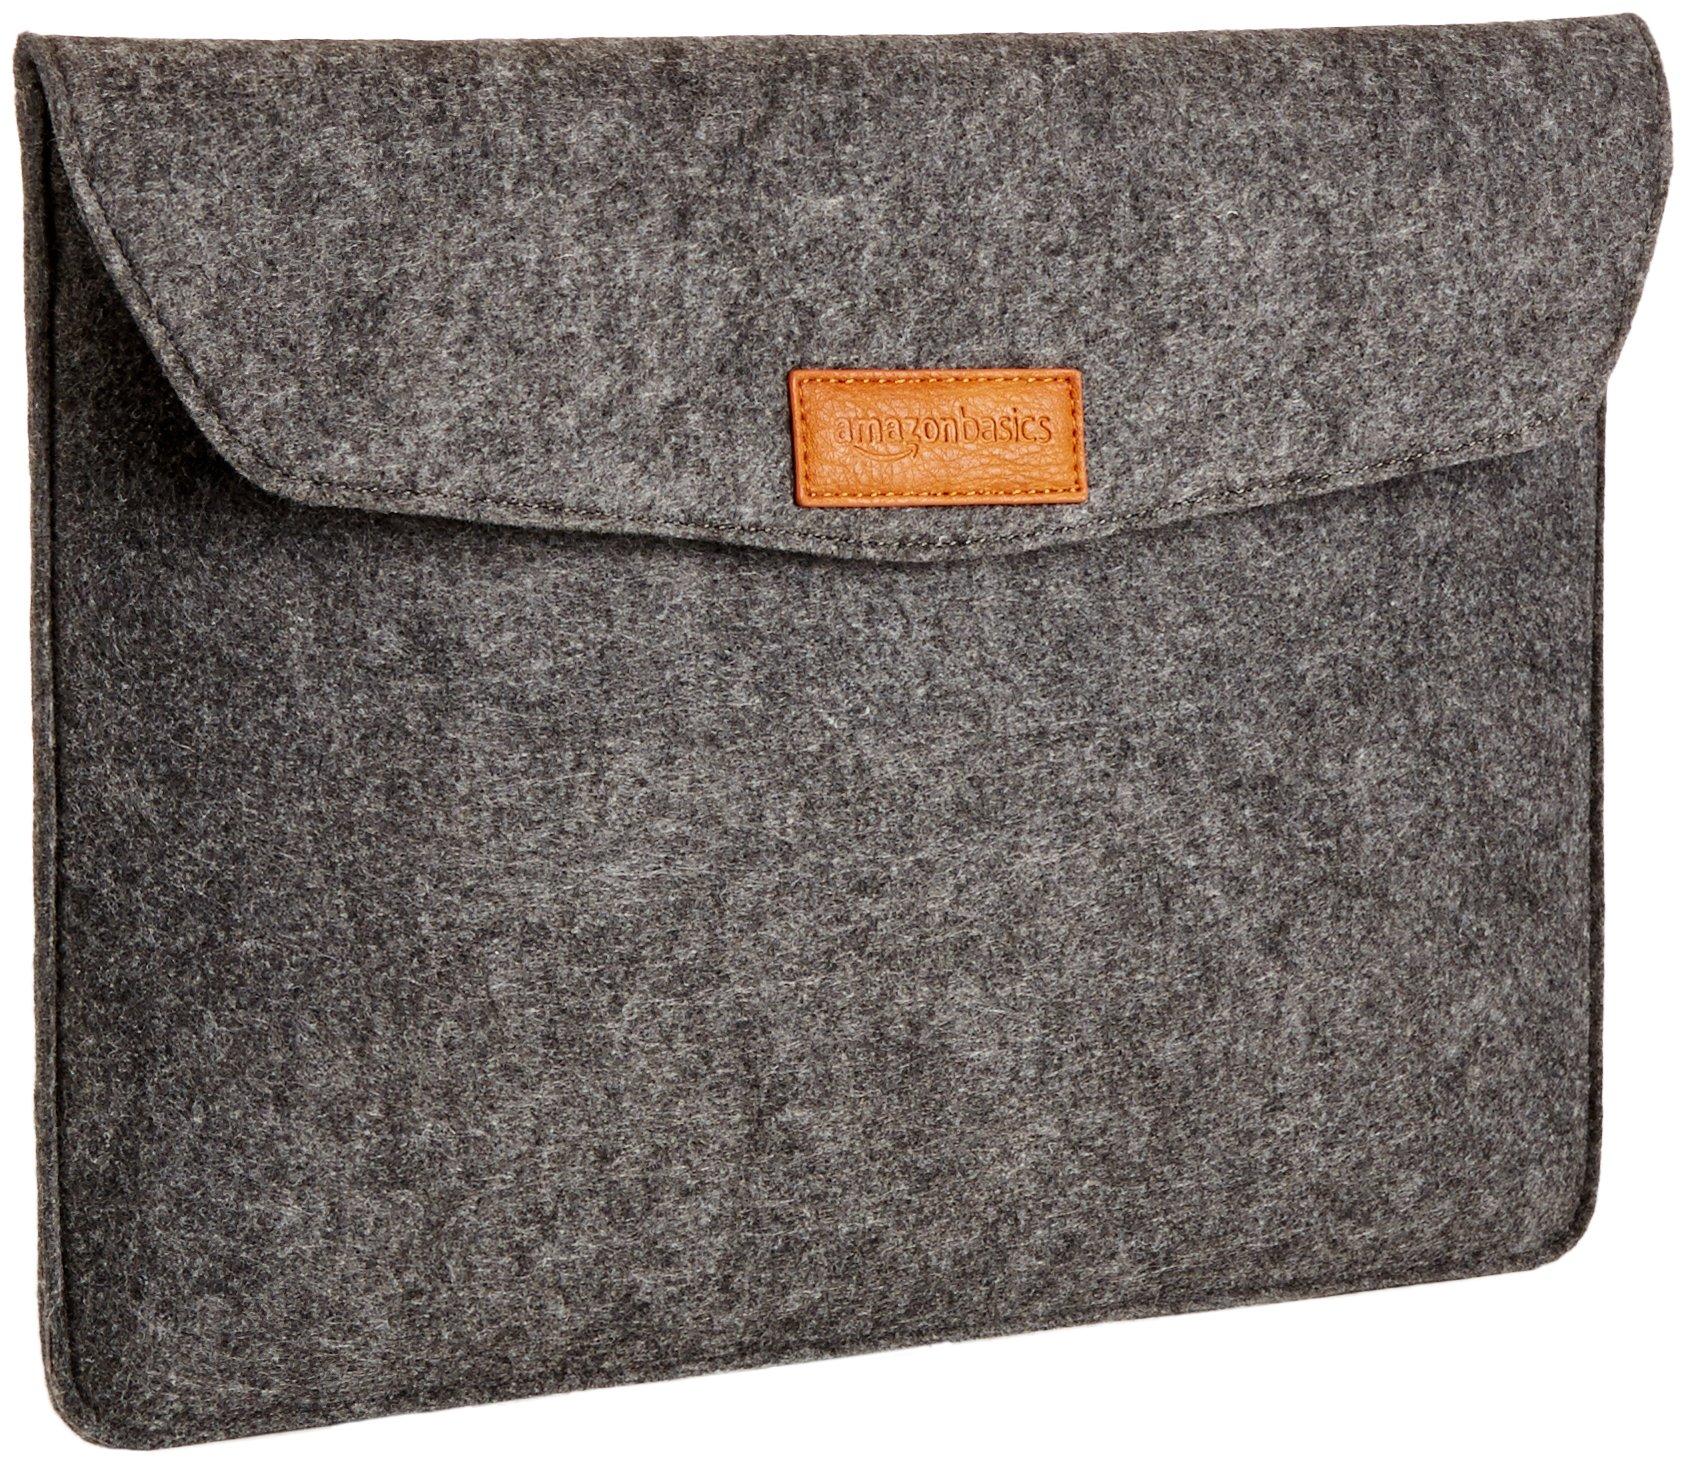 AmazonBasics 13 Inch Felt Macbook Laptop Sleeve Case - Charcoal by AmazonBasics